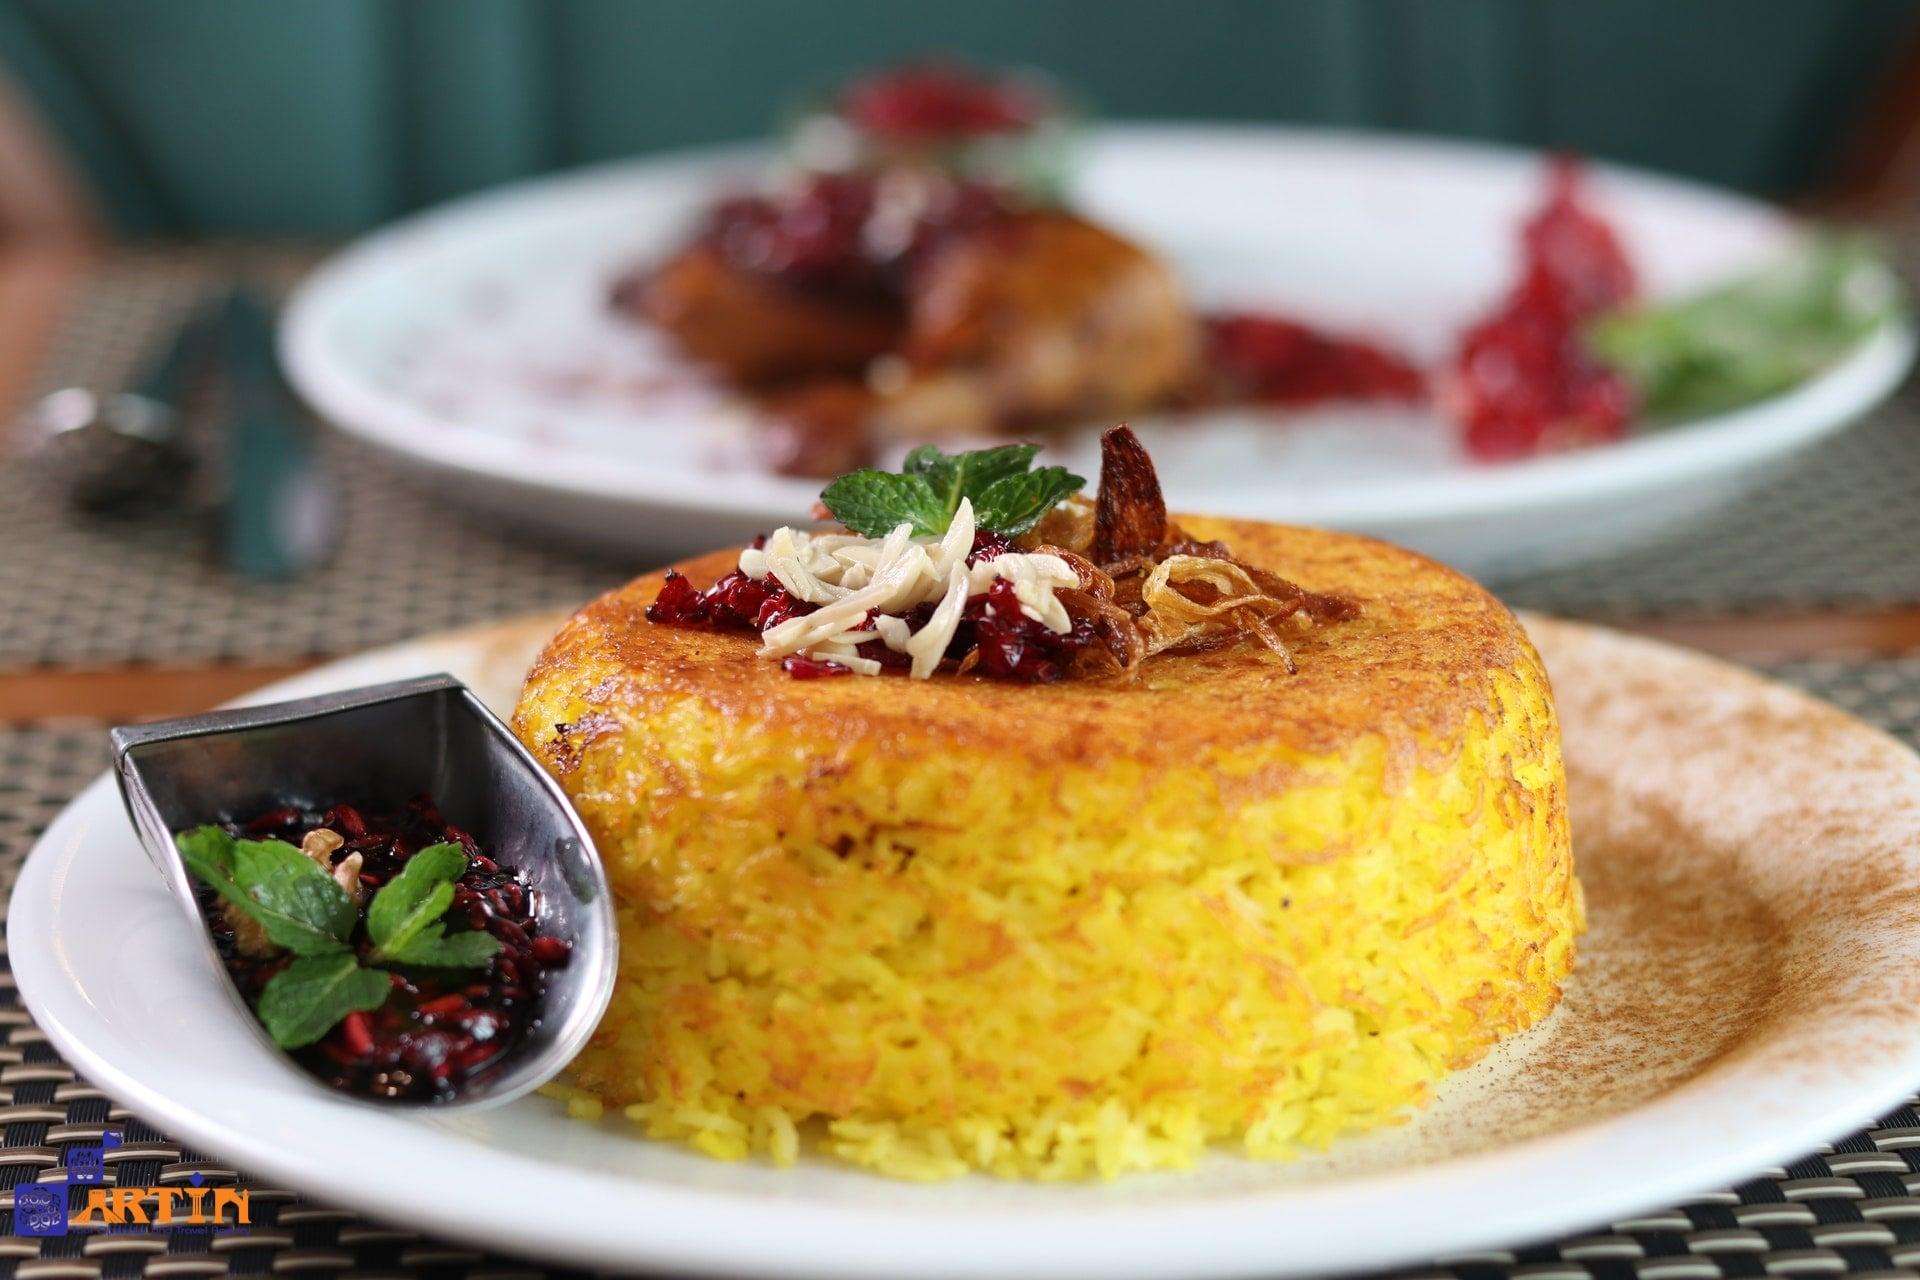 Tahchin delicious Persian dish